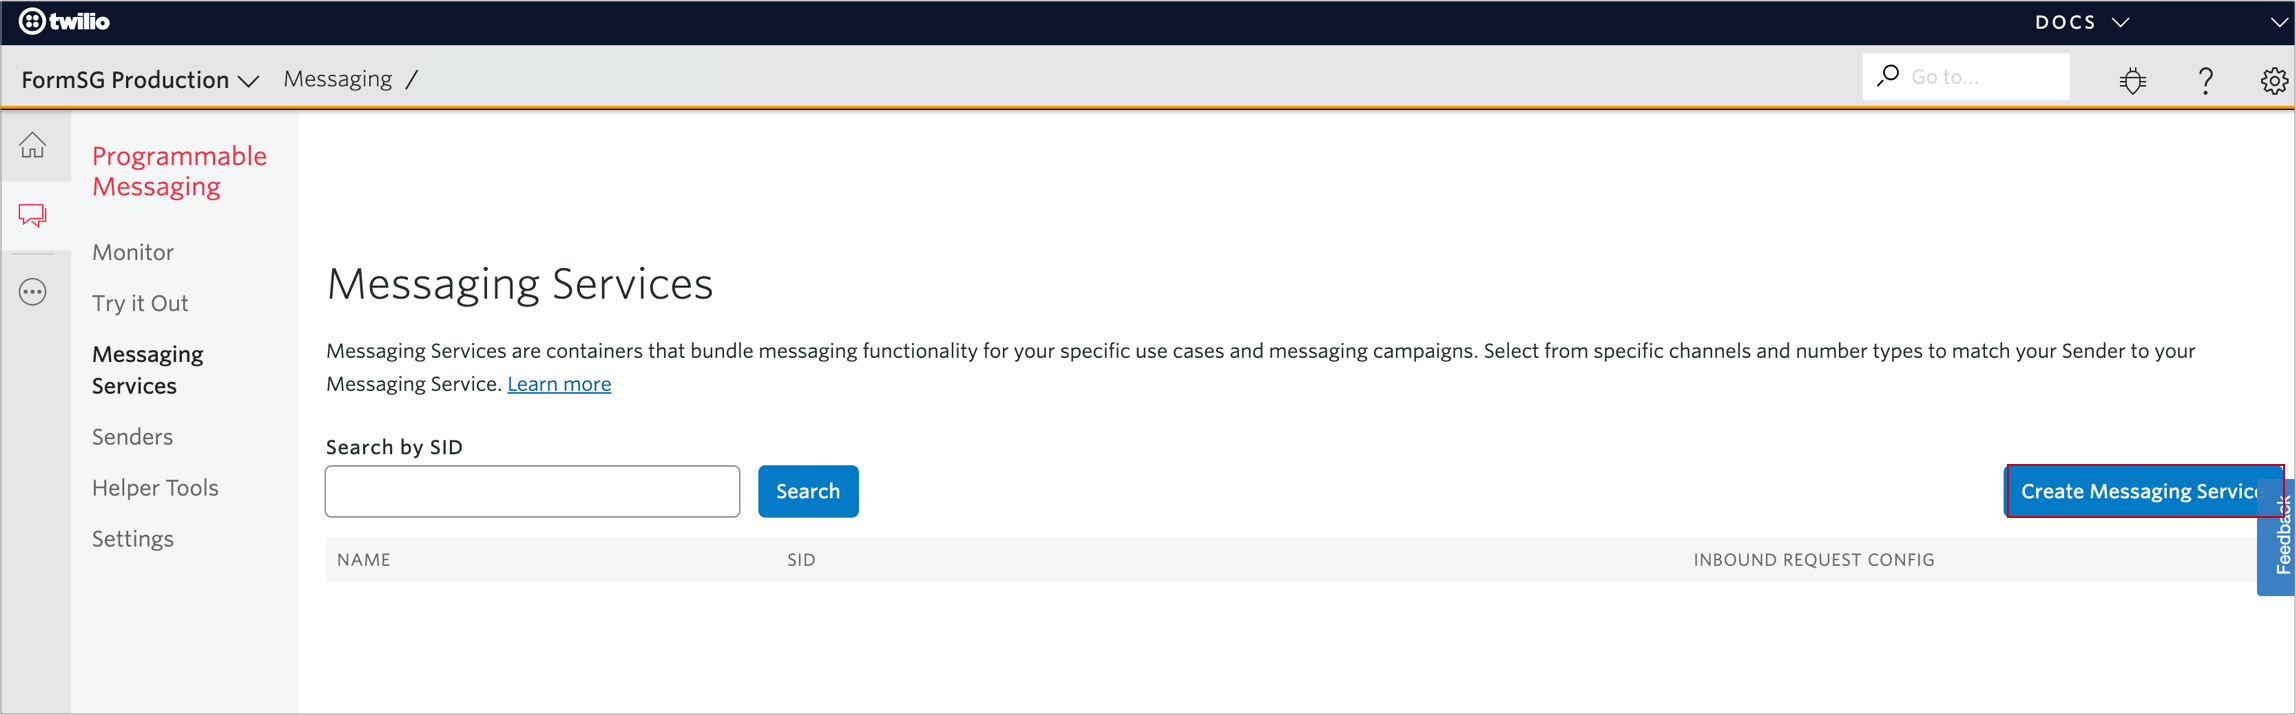 Create Messaging Service